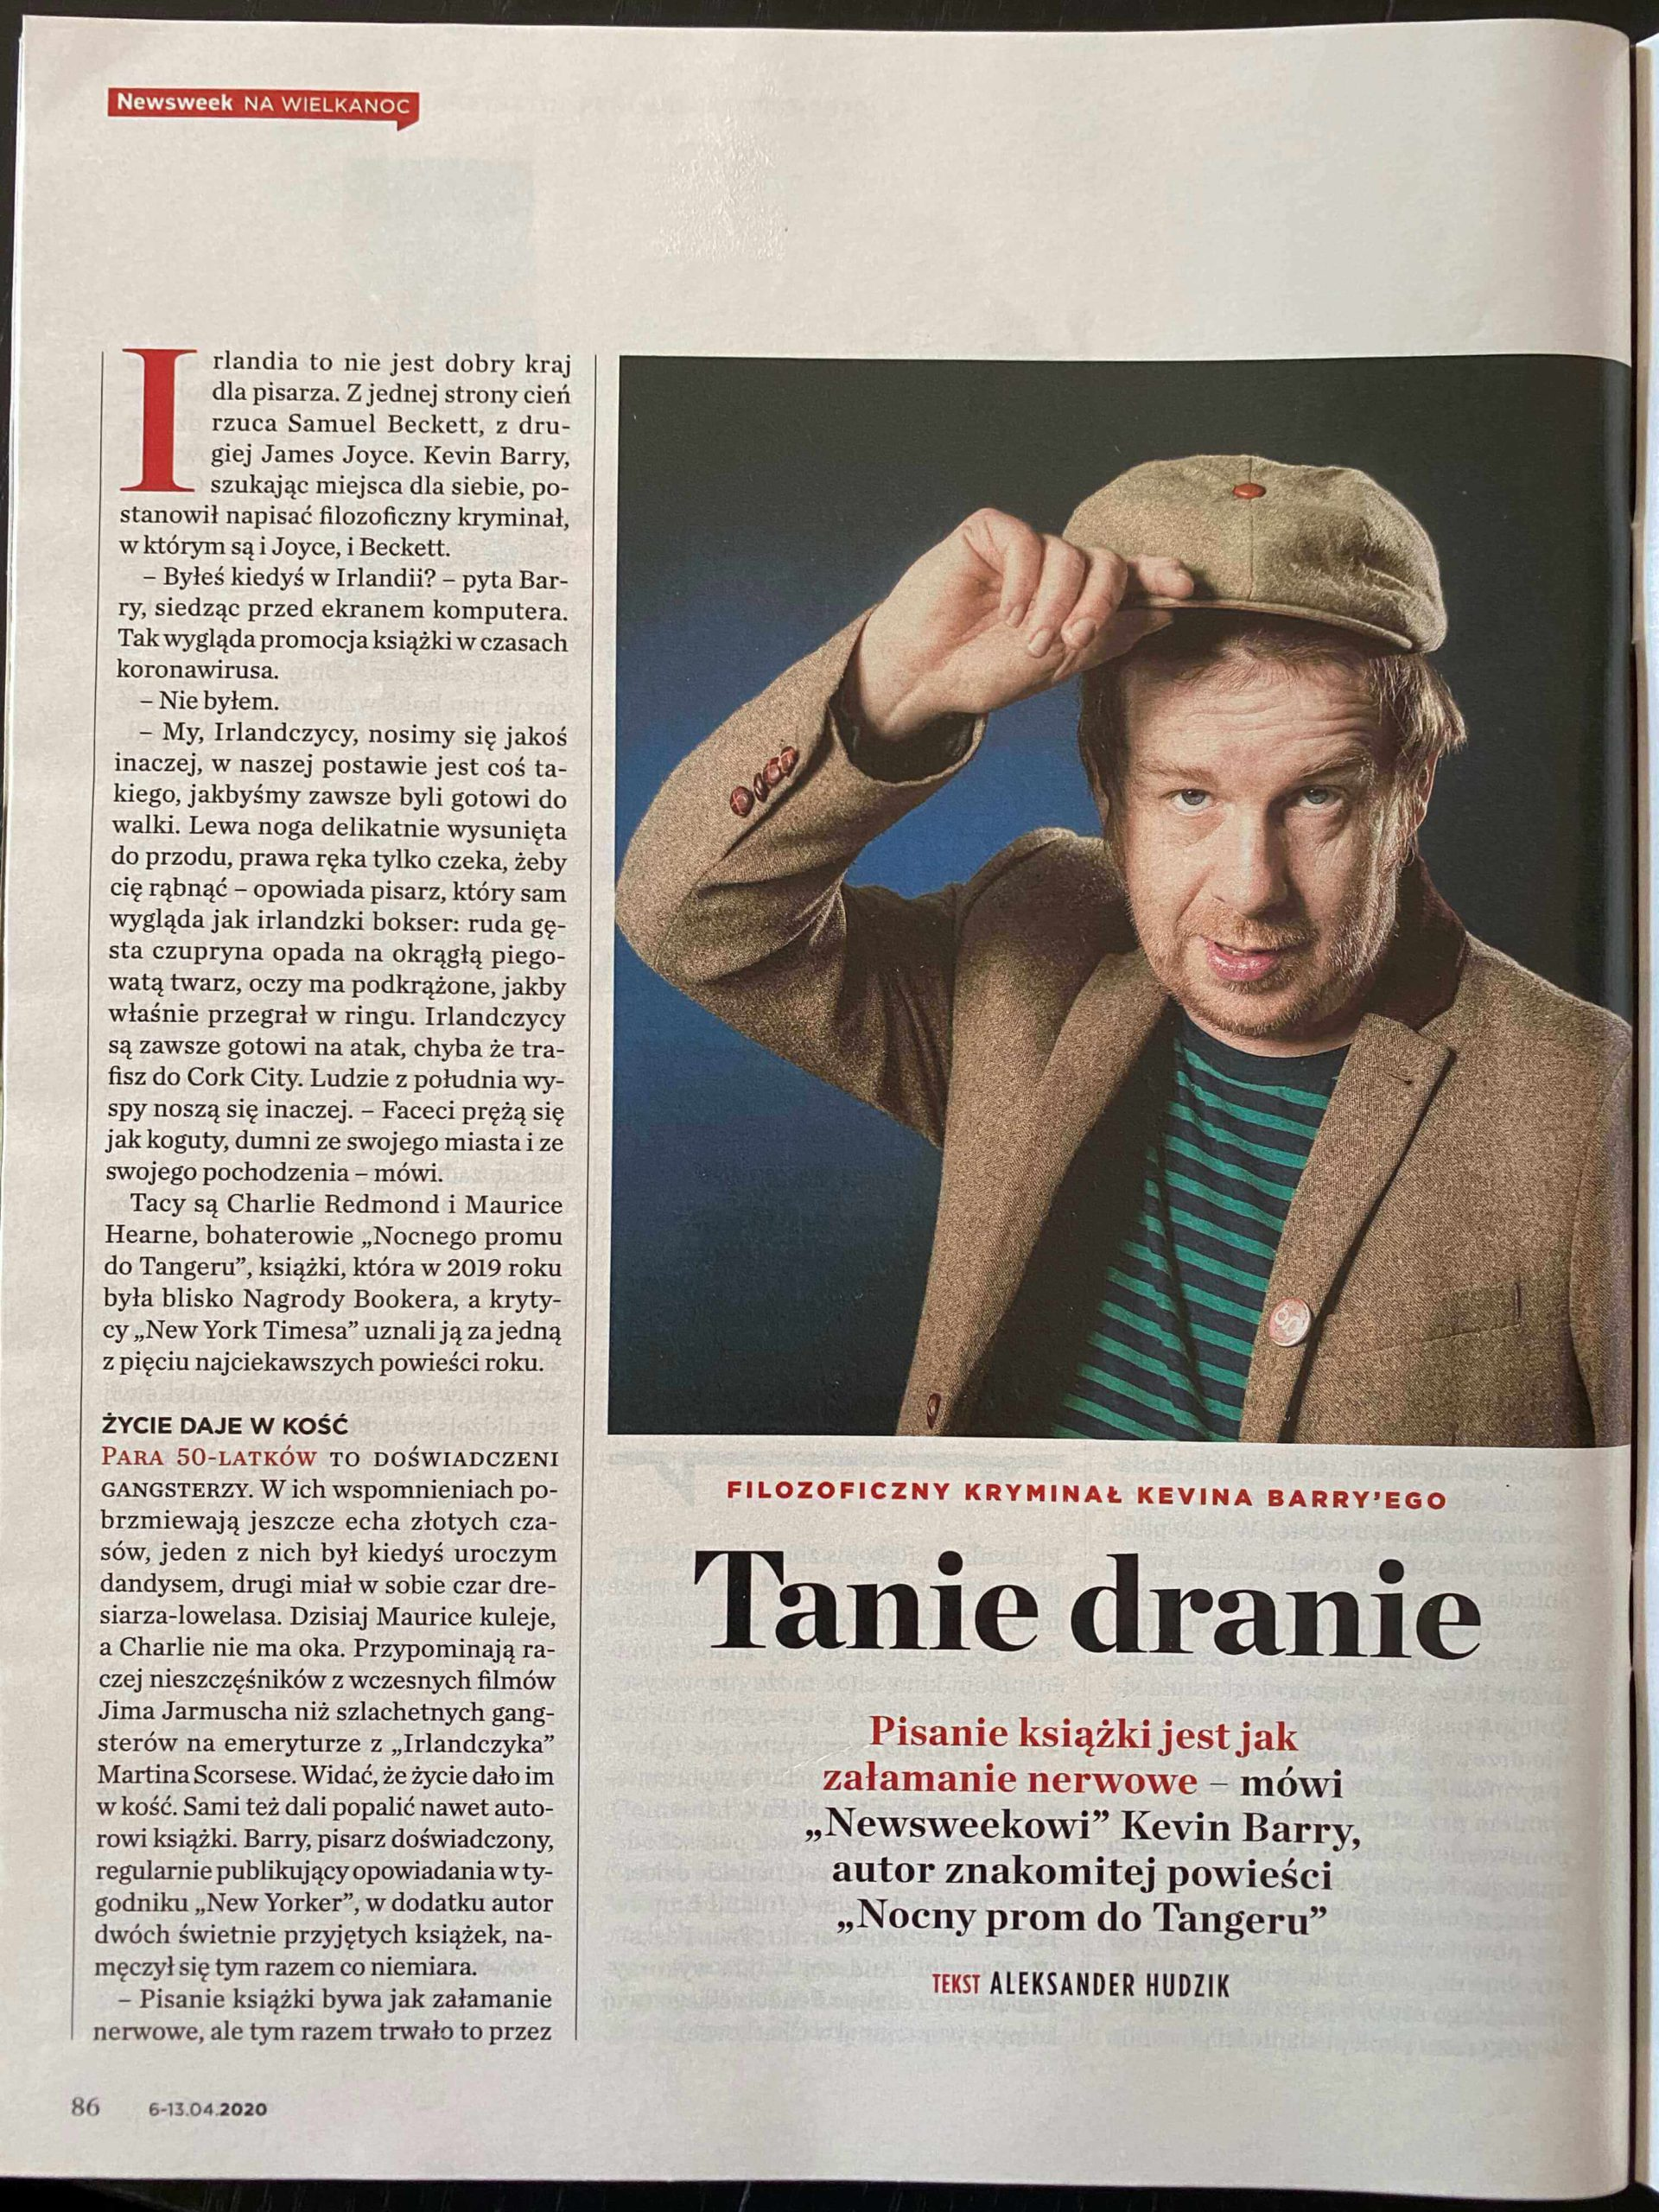 kevin barry. newsweek 15_2020 cz. 1-2-2-2-2